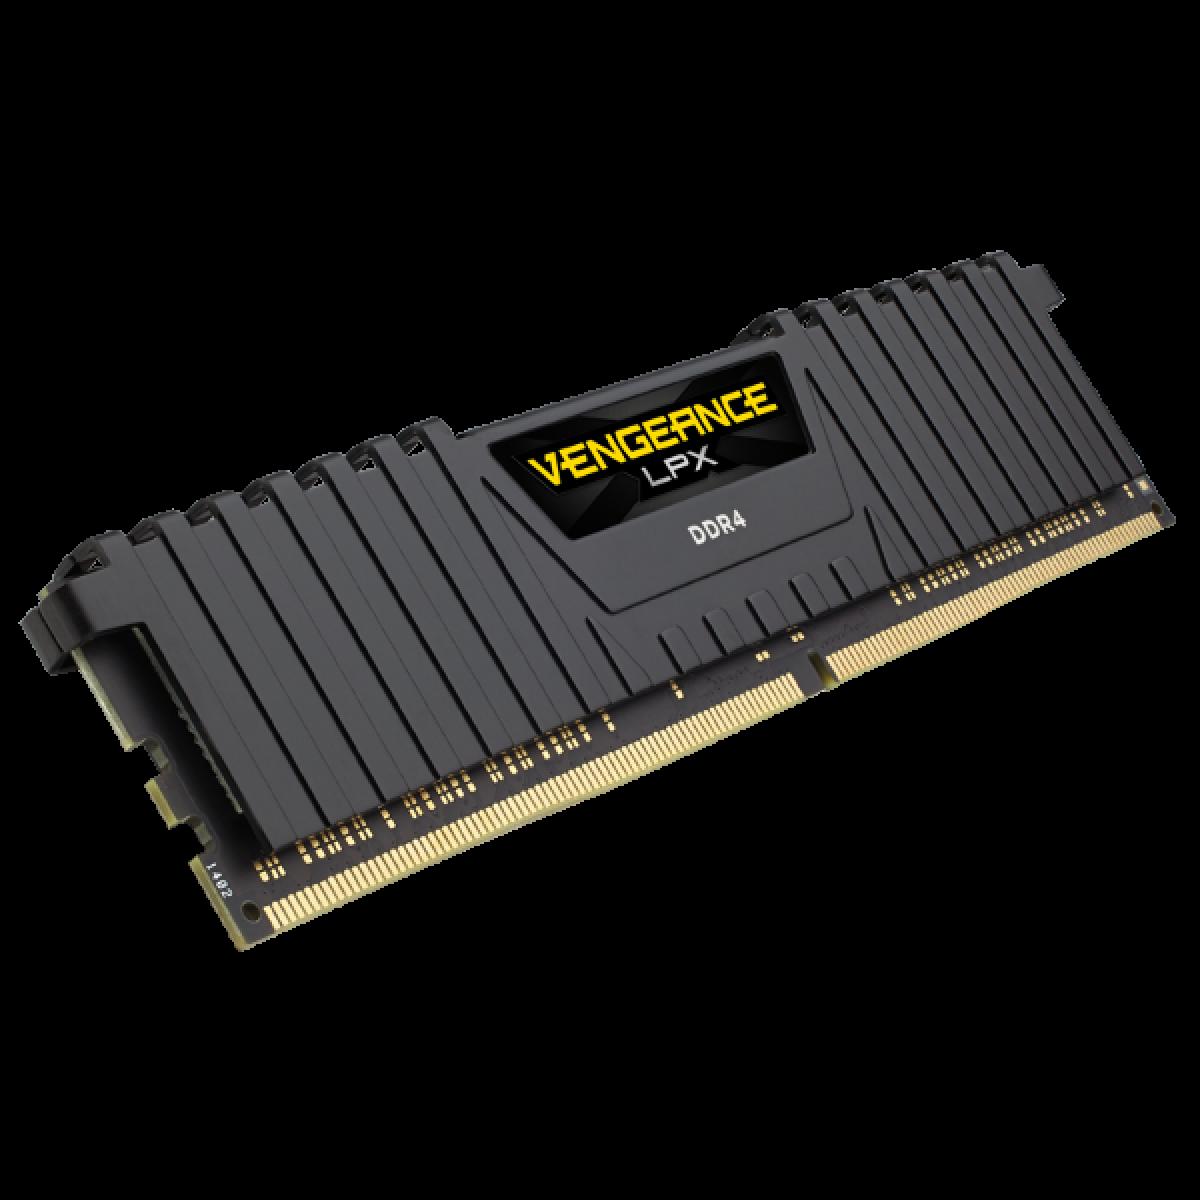 Memória DDR4 Corsair Vengeance LPX, 16GB 3000MHz, CMK16GX4M1D3000C16